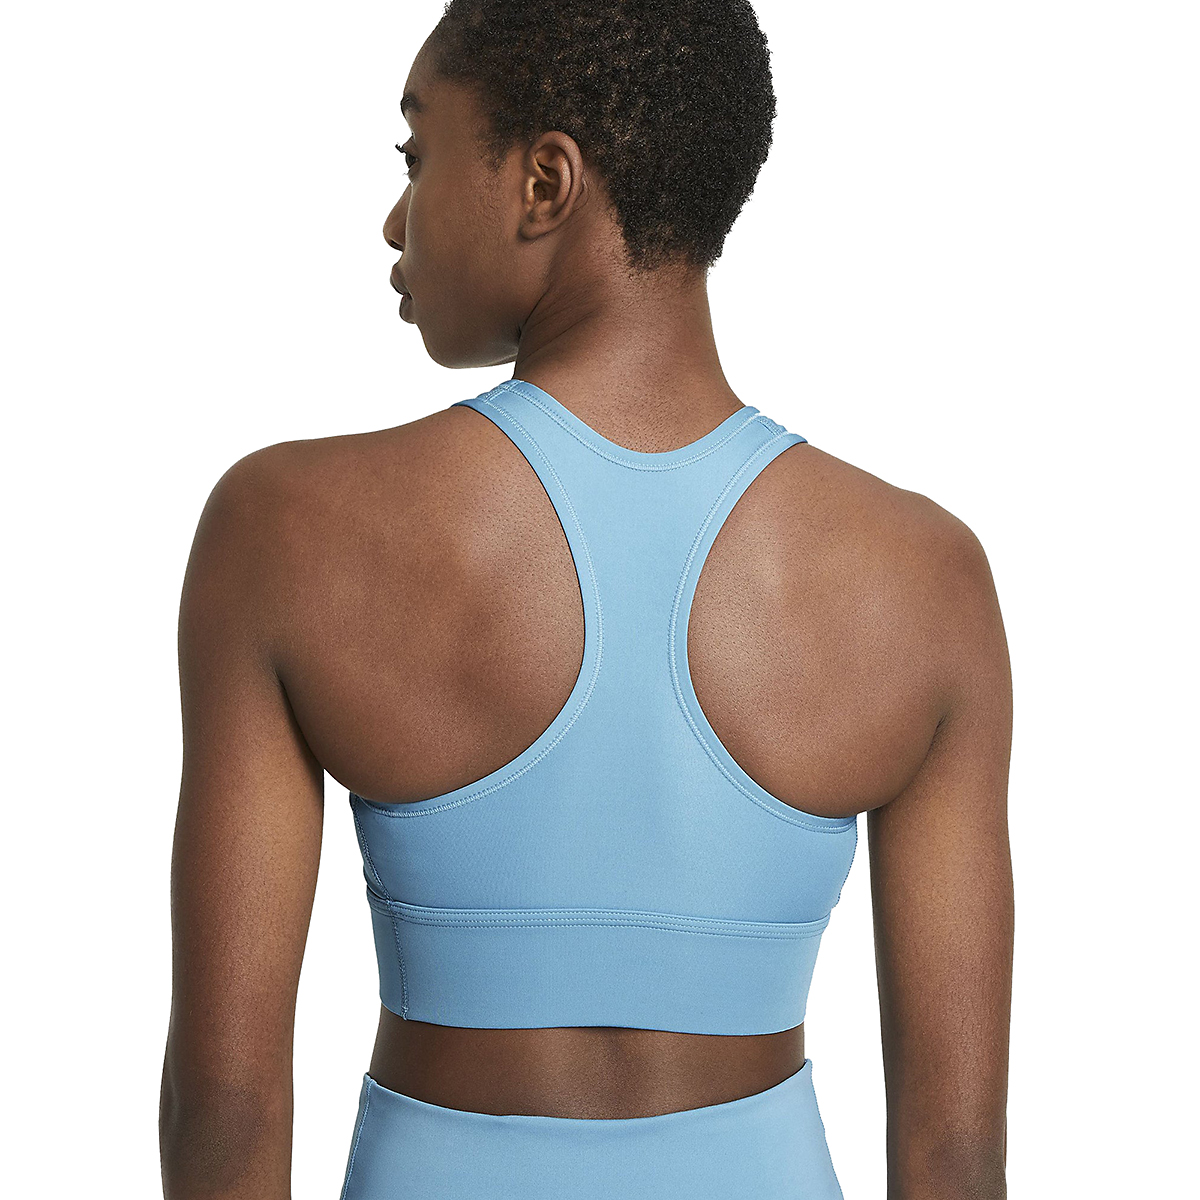 Women's Nike Swoosh Long Line Bra, , large, image 4